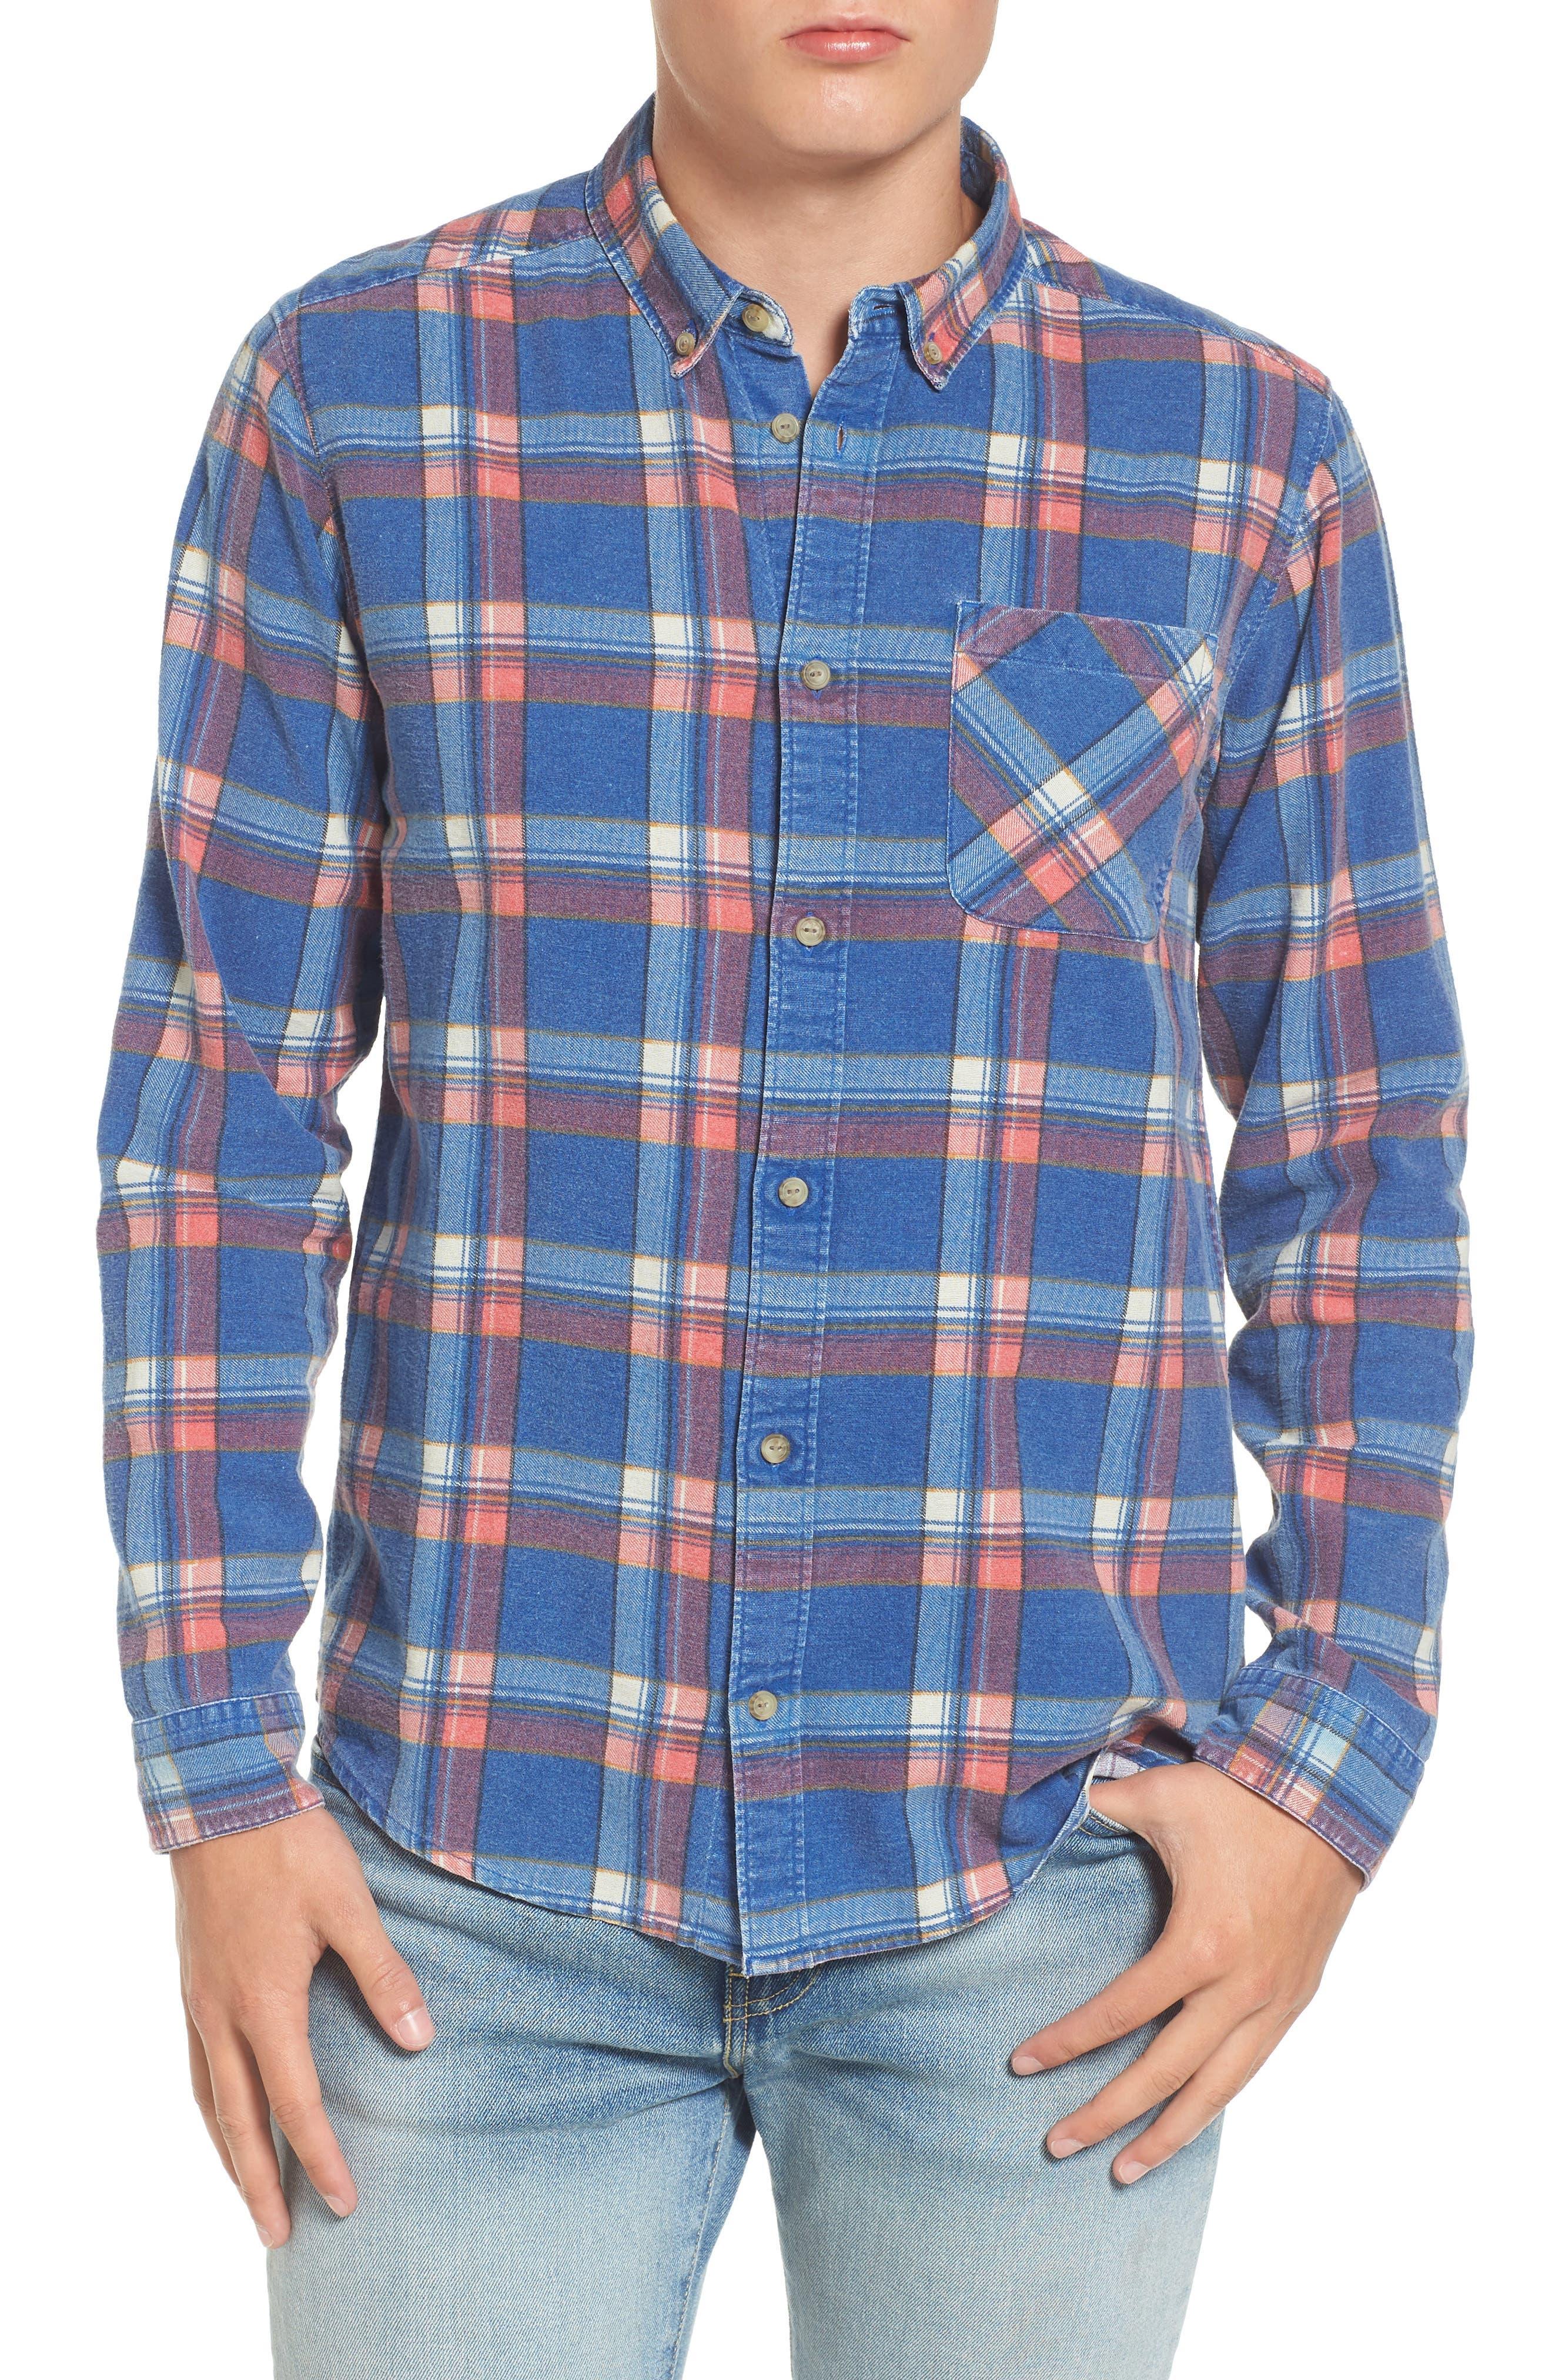 Main Image - RVCA x Kevin Long Plaid Shirt